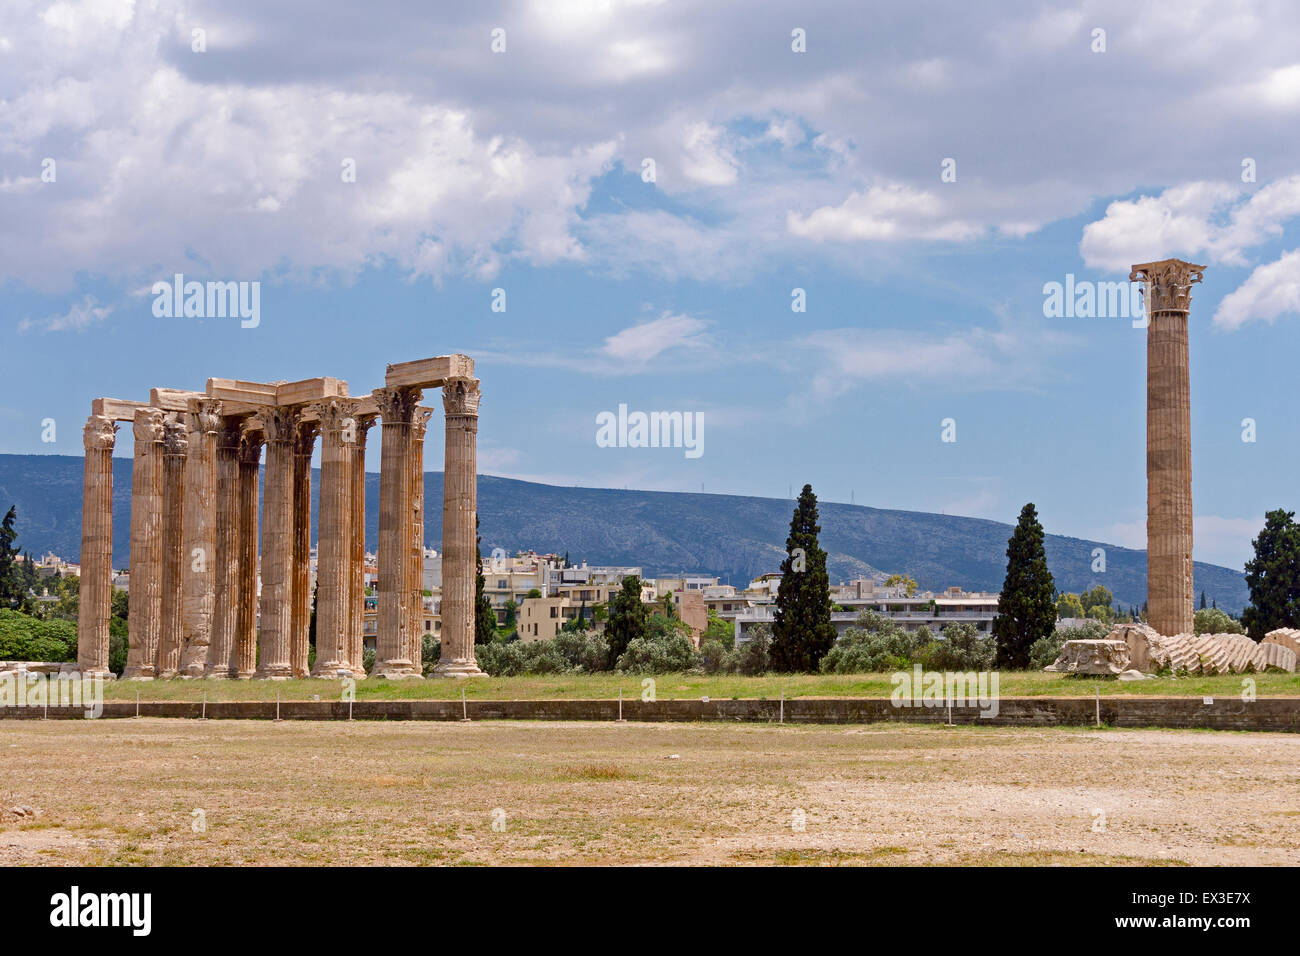 Temple of Olympian Zeus, Olympieion, Athens, Greece - Stock Image